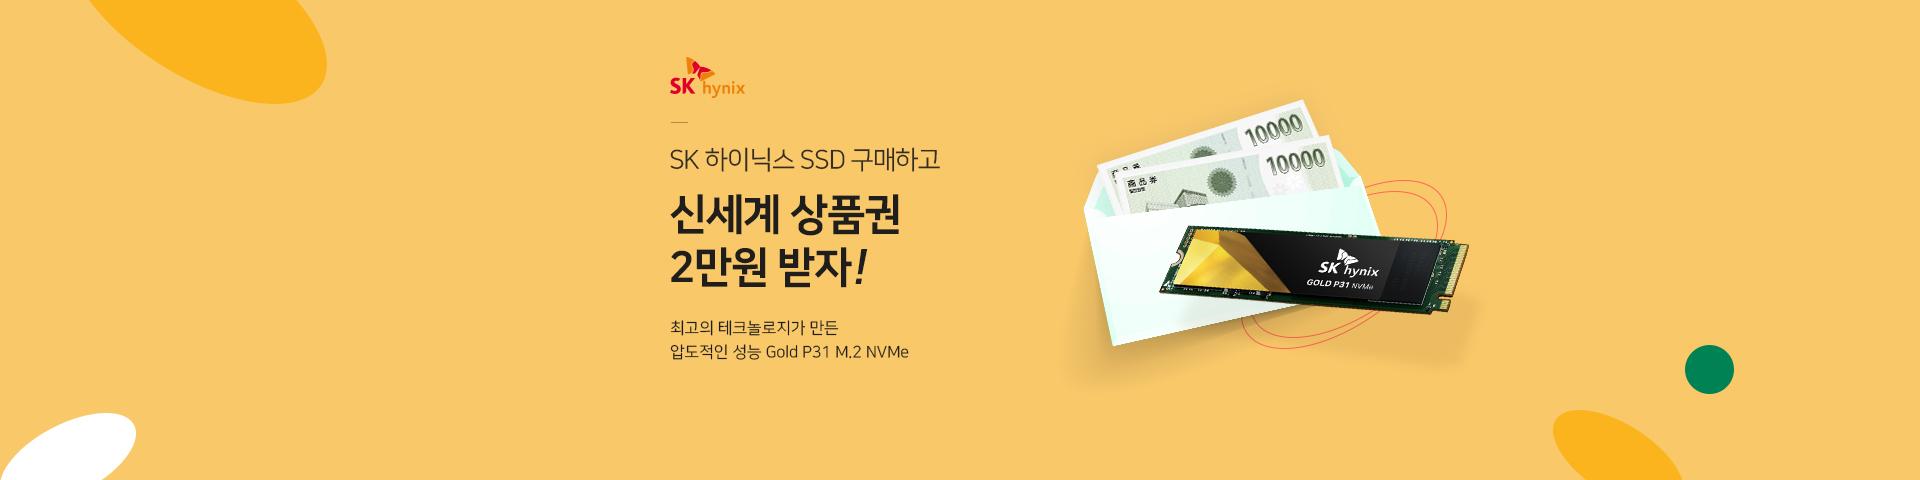 [SK 하이닉스] SSD 상품권 지급 프로모션